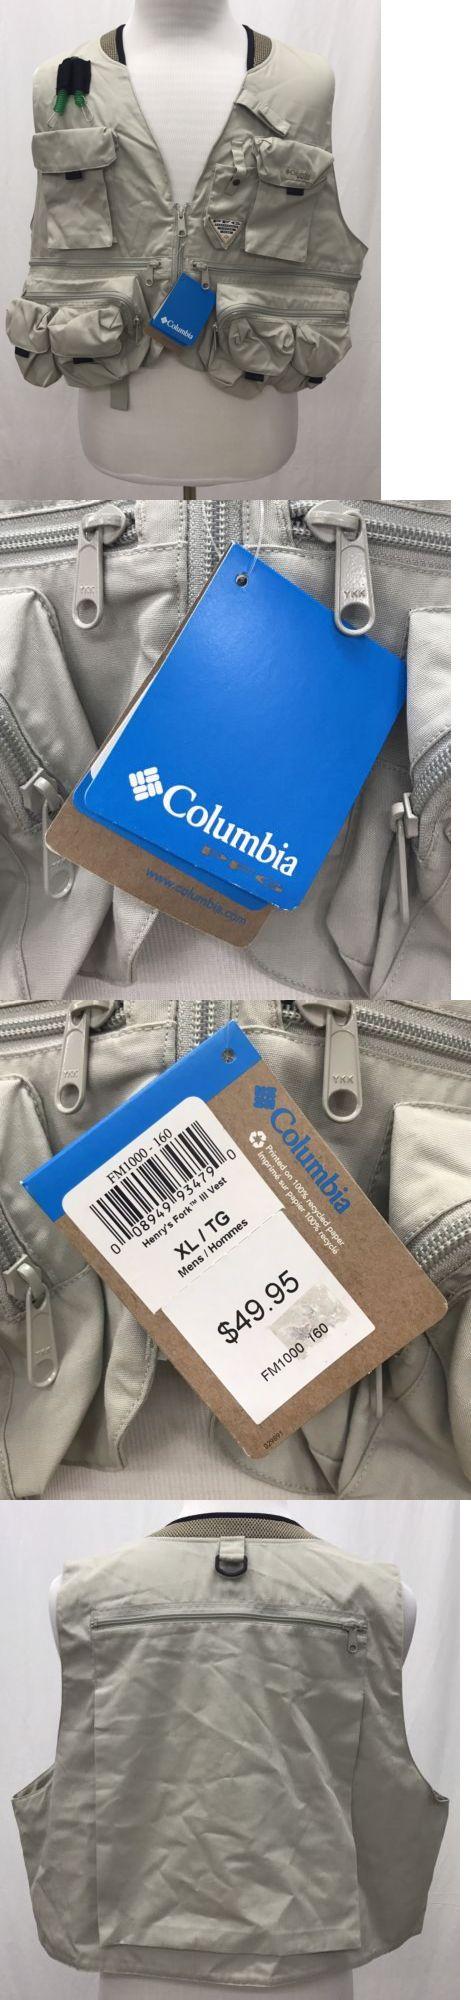 Vests 65982: Nwt Columbia Henry S Fork Ii Fishing Vest - Men S Xl - Msrp $49.95 -> BUY IT NOW ONLY: $34.99 on eBay!